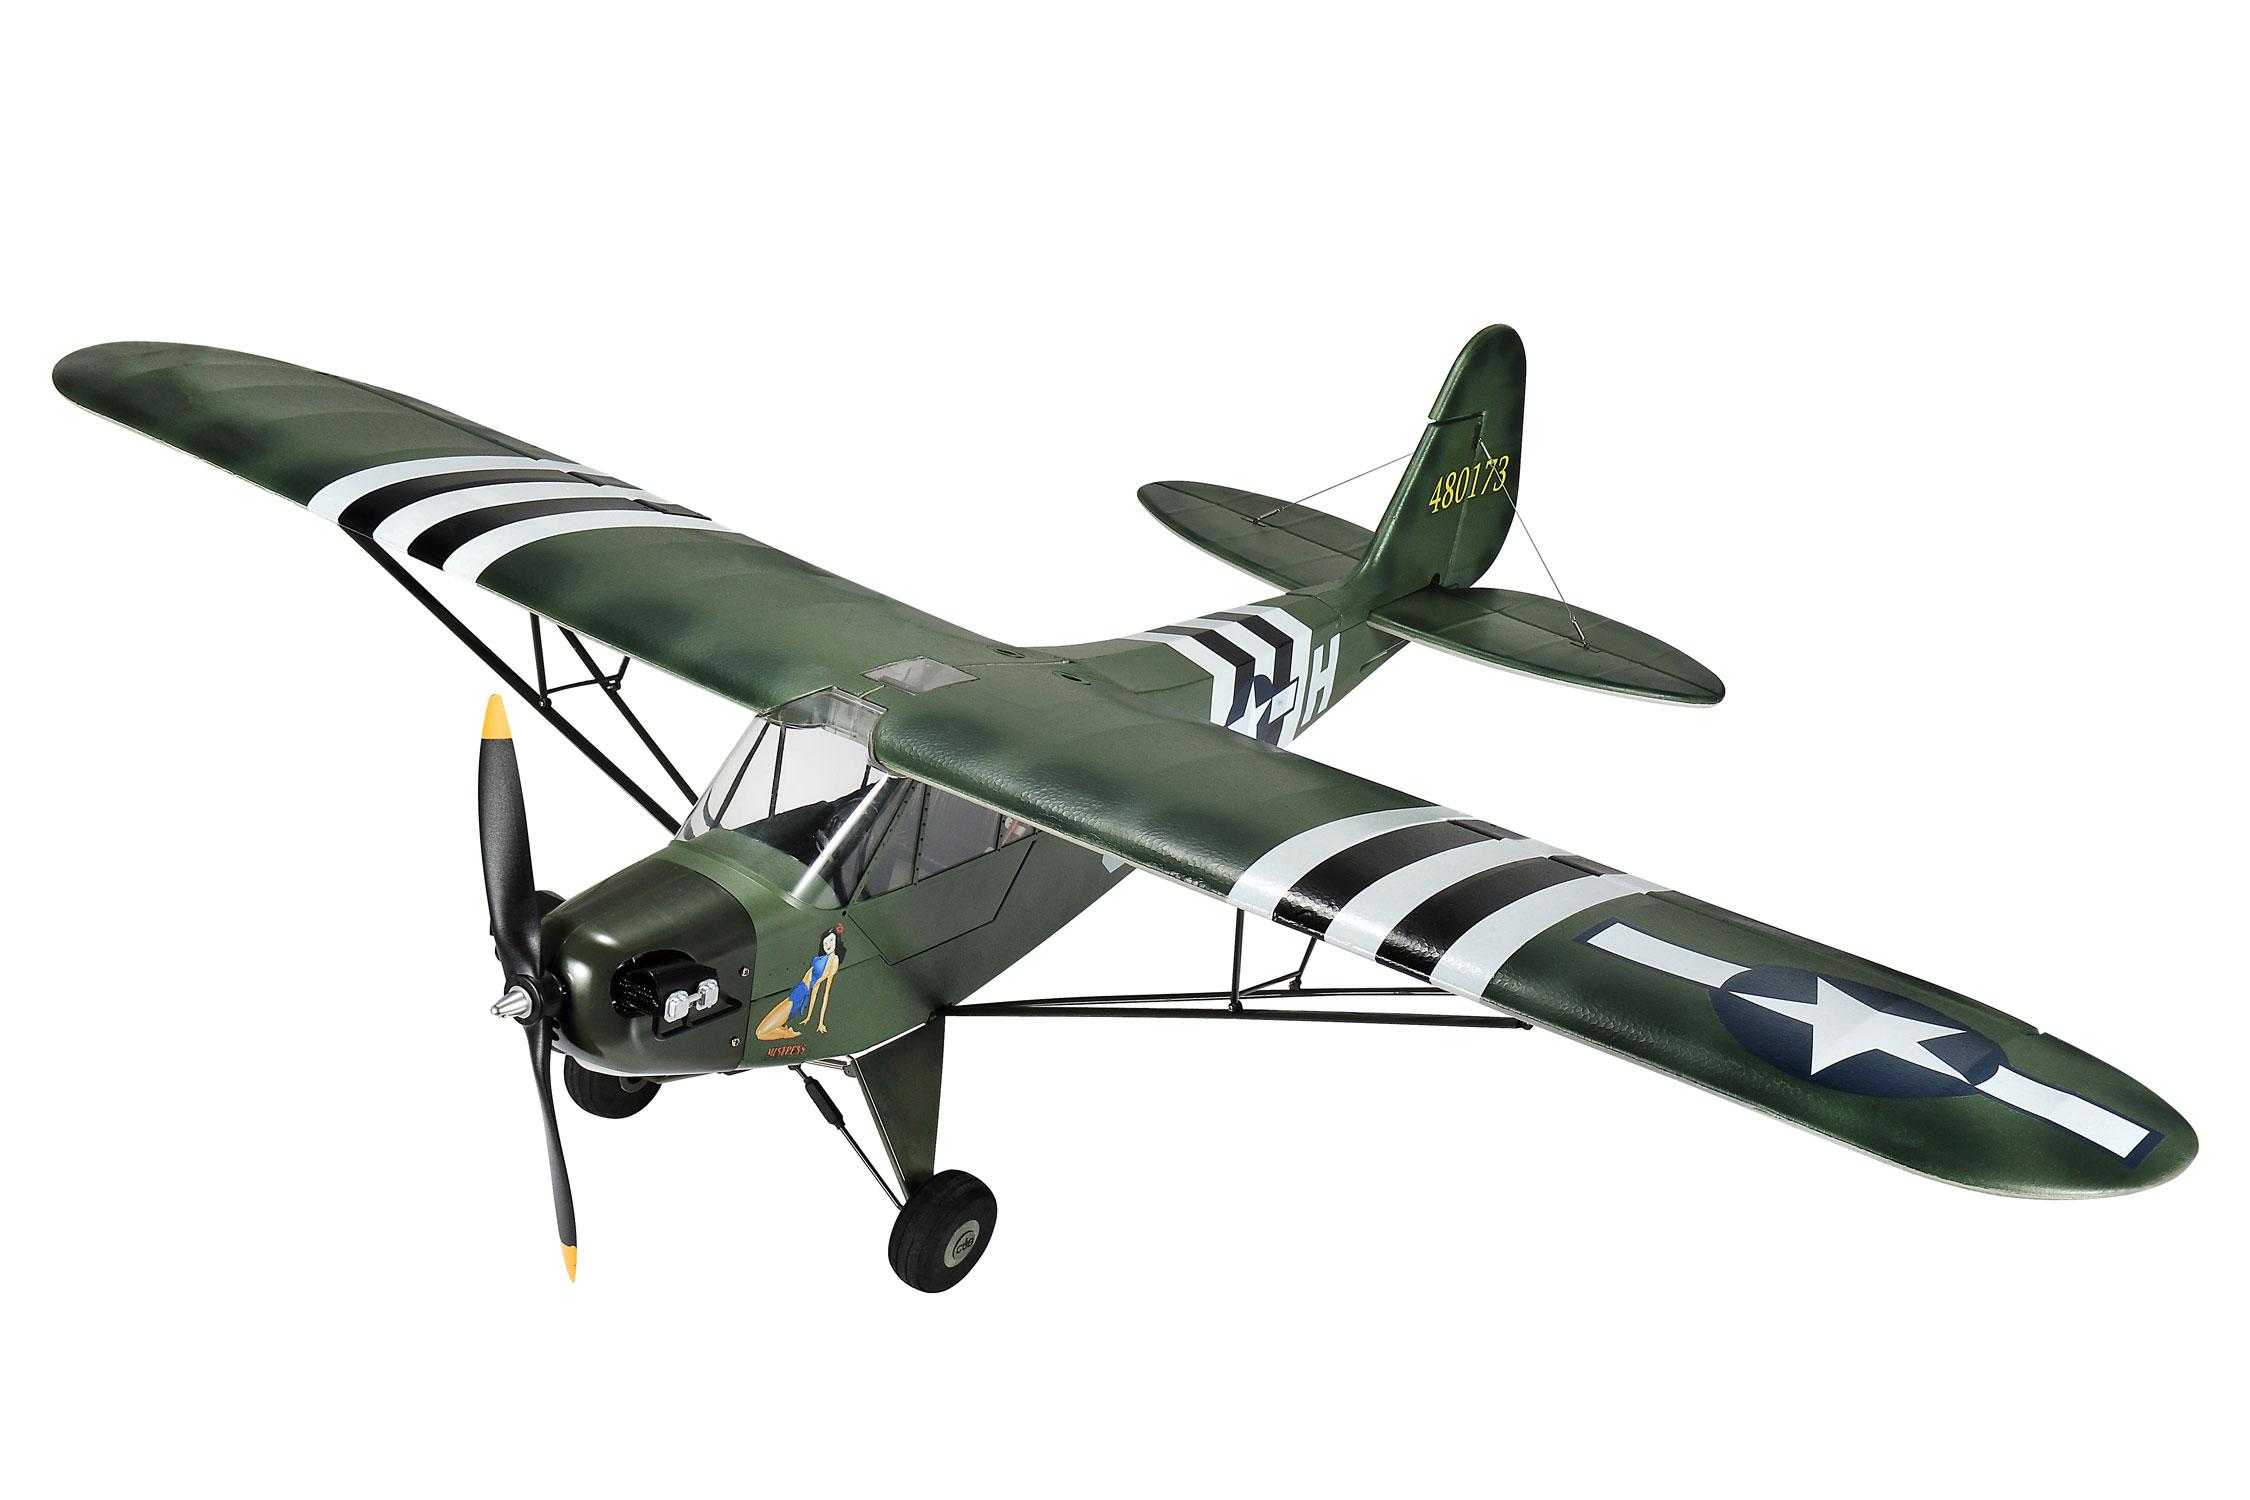 Mile High RC - J3 Cub,Piper Pawnee,Yak 54, foamy, foam rc,Gold Wing